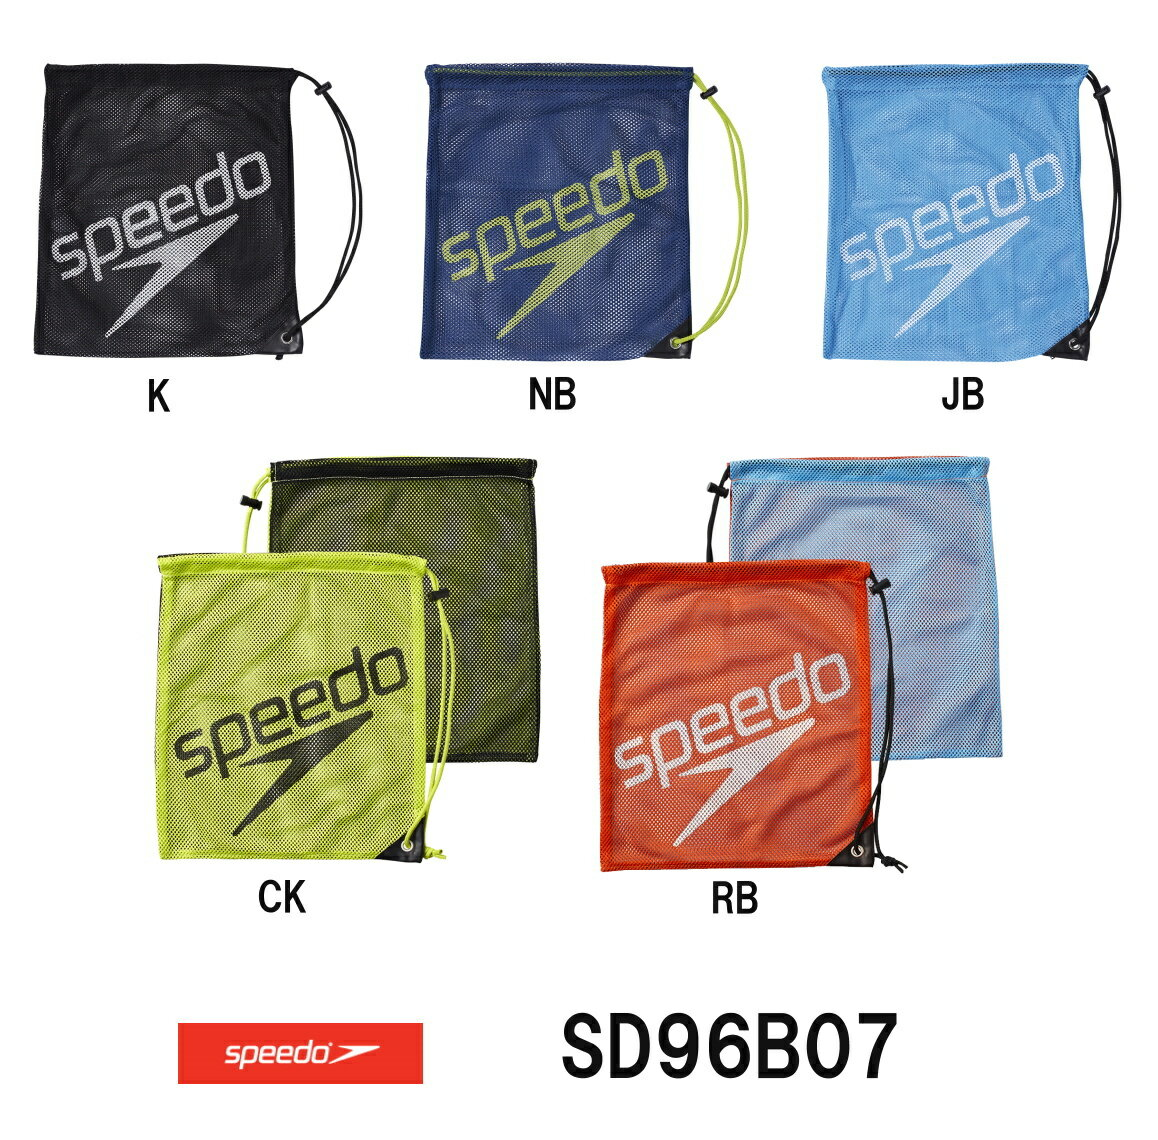 SPEEDO スピード メッシュバッグ(M) SD96B07